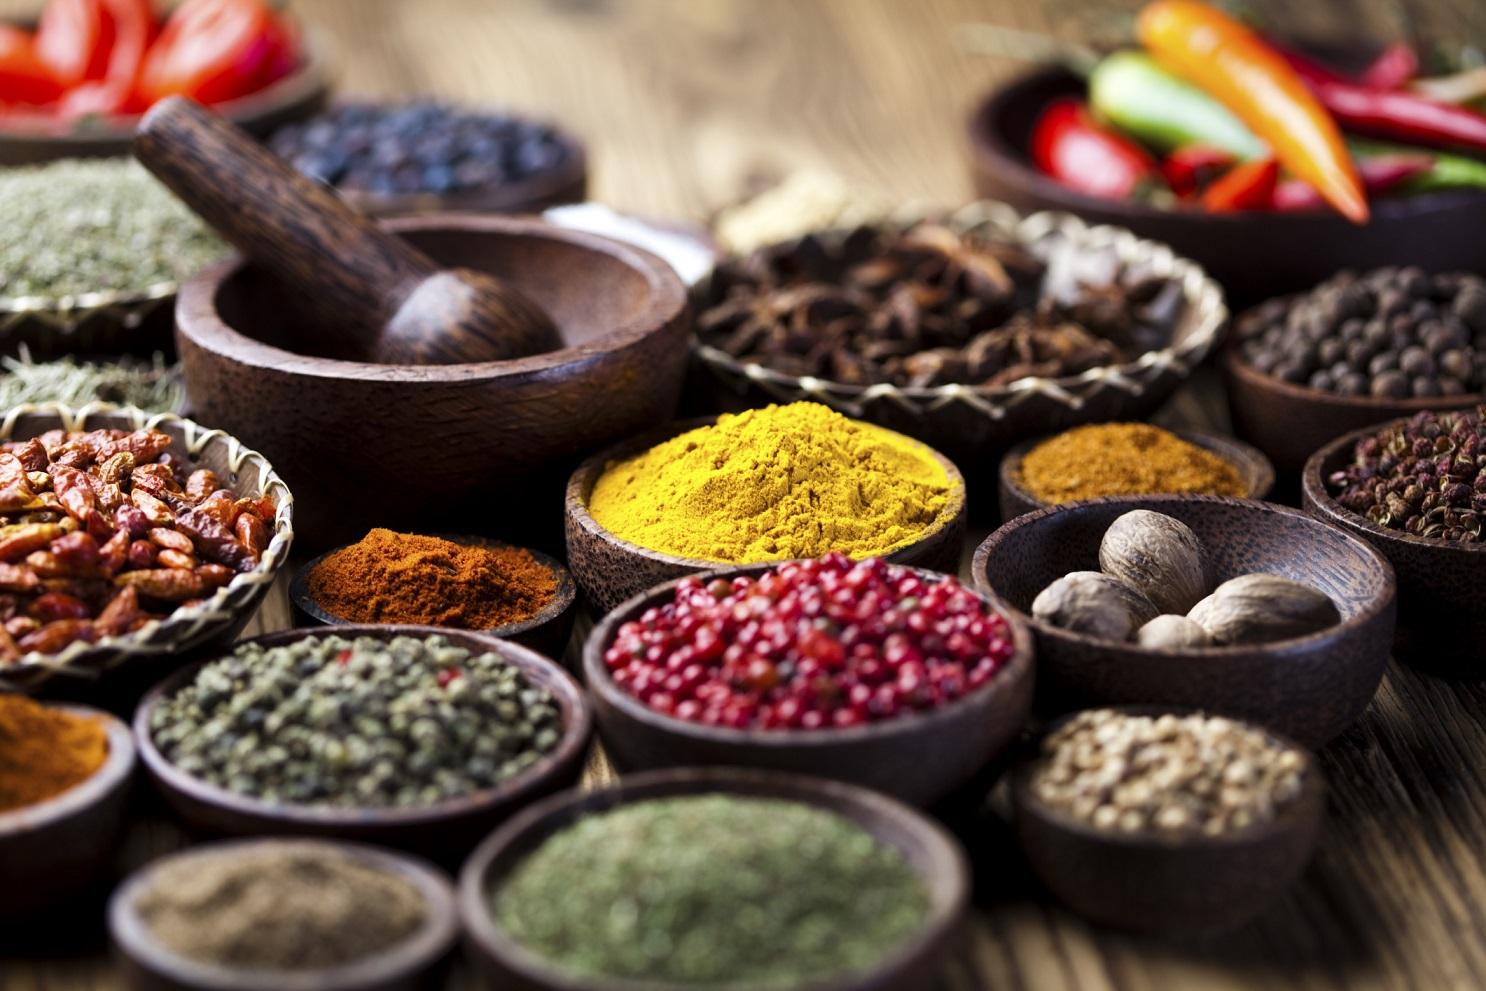 Come usare le spezie in cucina ayurveda in toscana - Le spezie in cucina ...